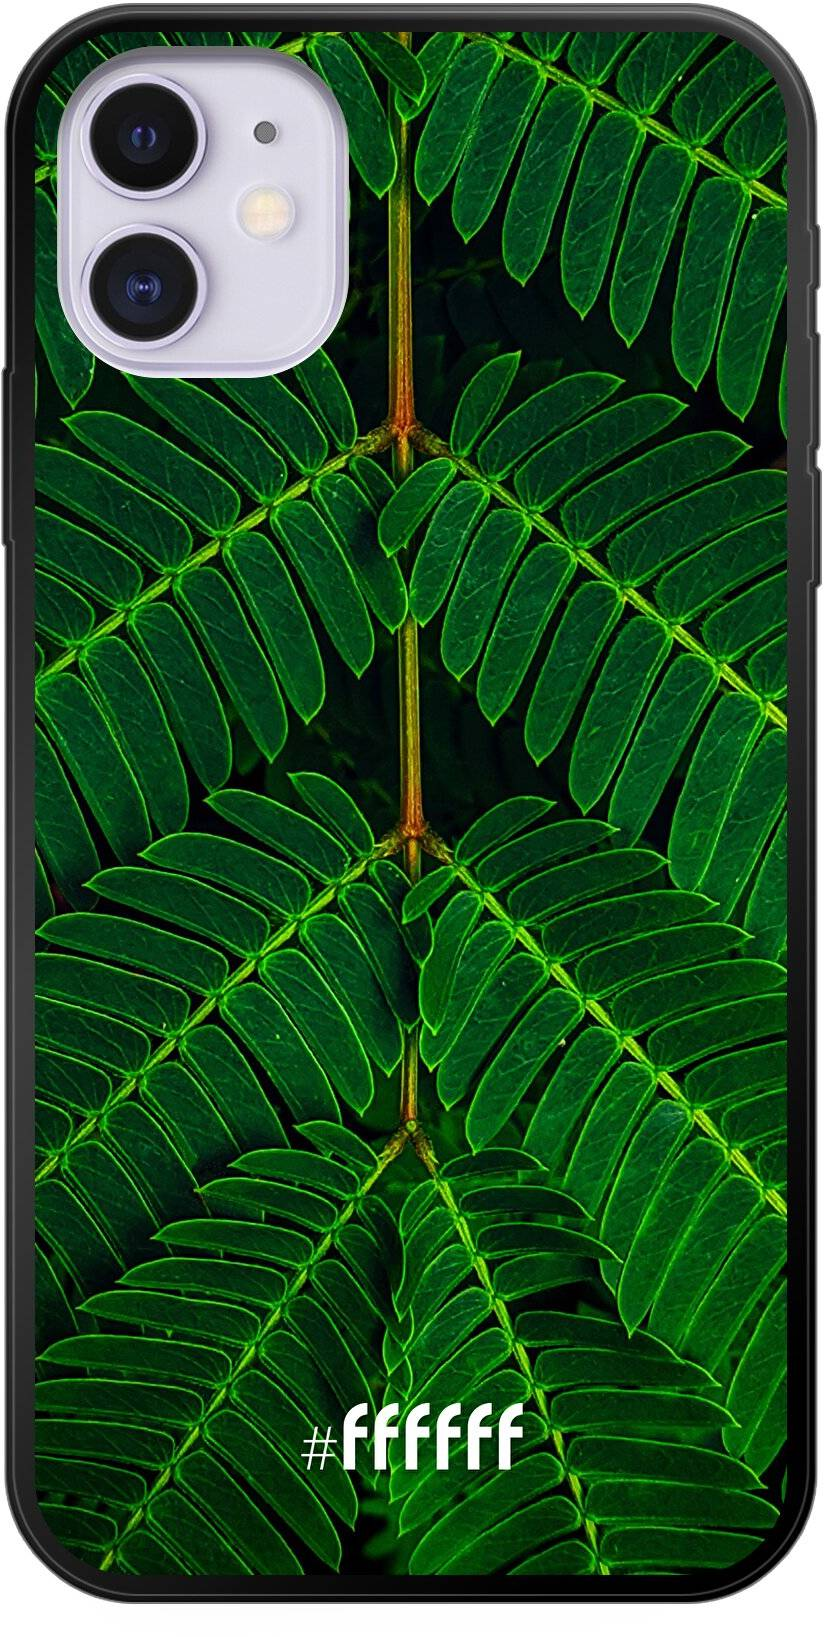 Symmetric Plants iPhone 11